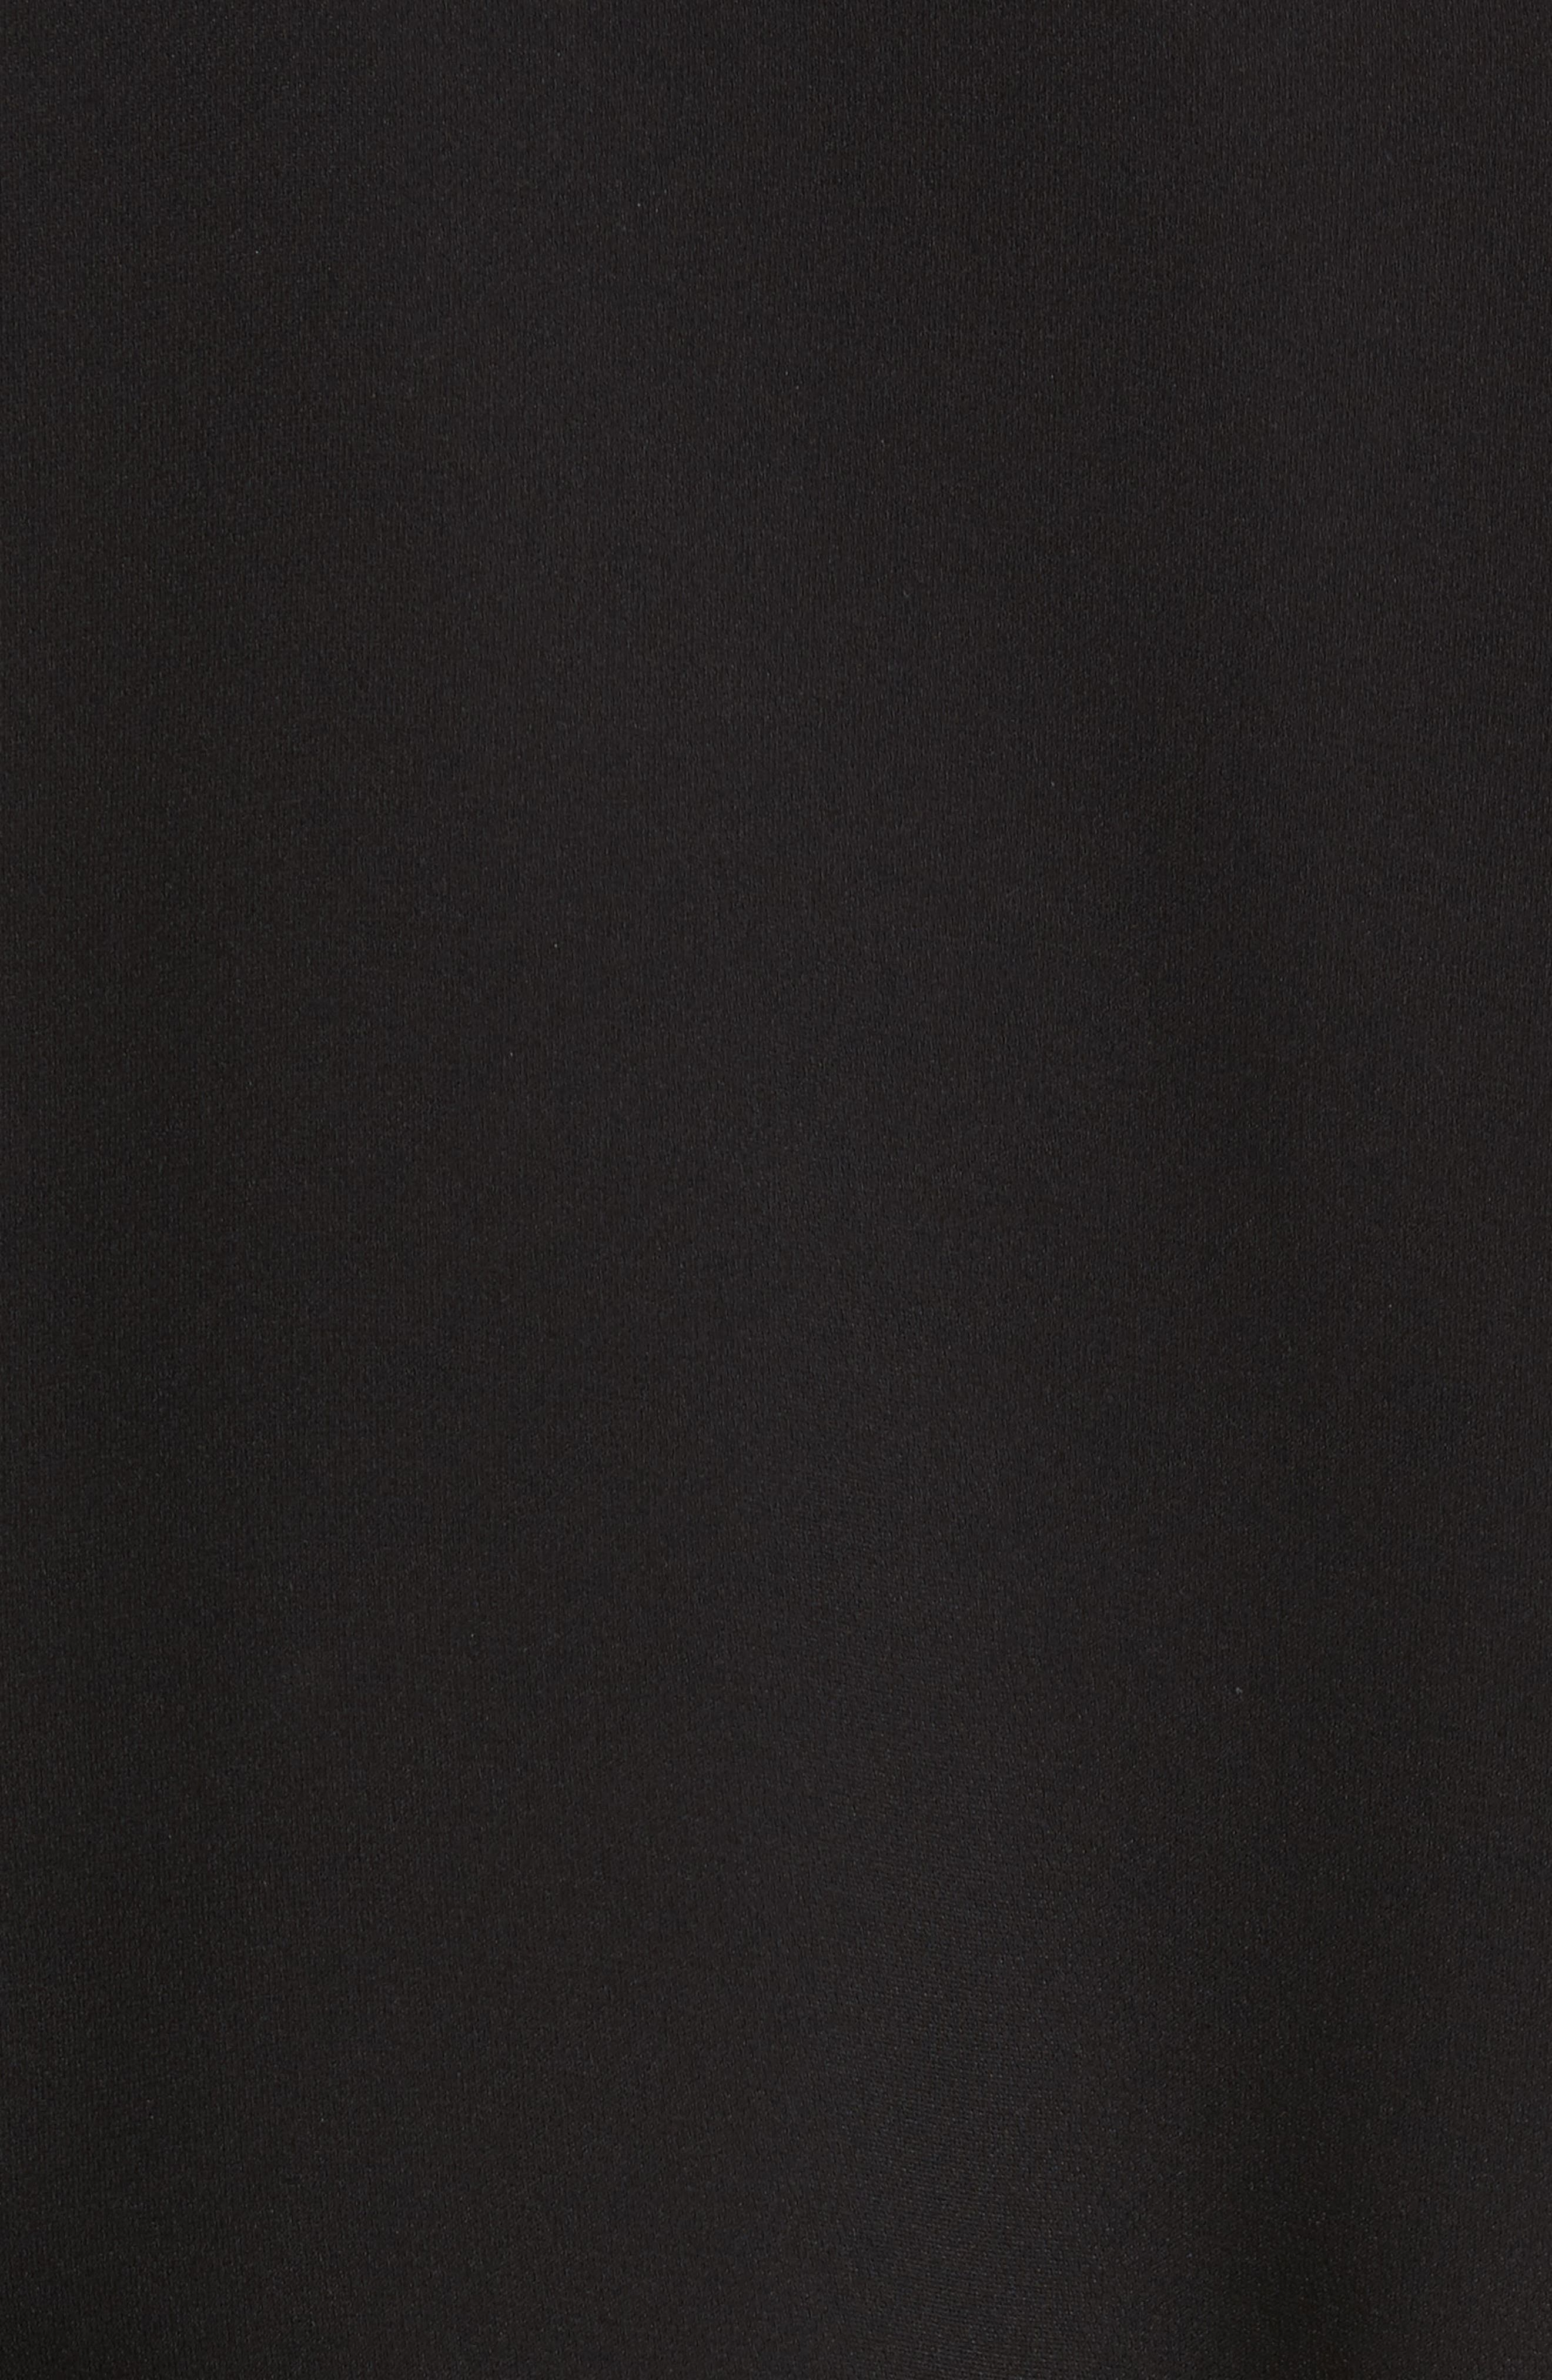 Lara One-Shoulder Tie Silk Top,                             Alternate thumbnail 7, color,                             Black